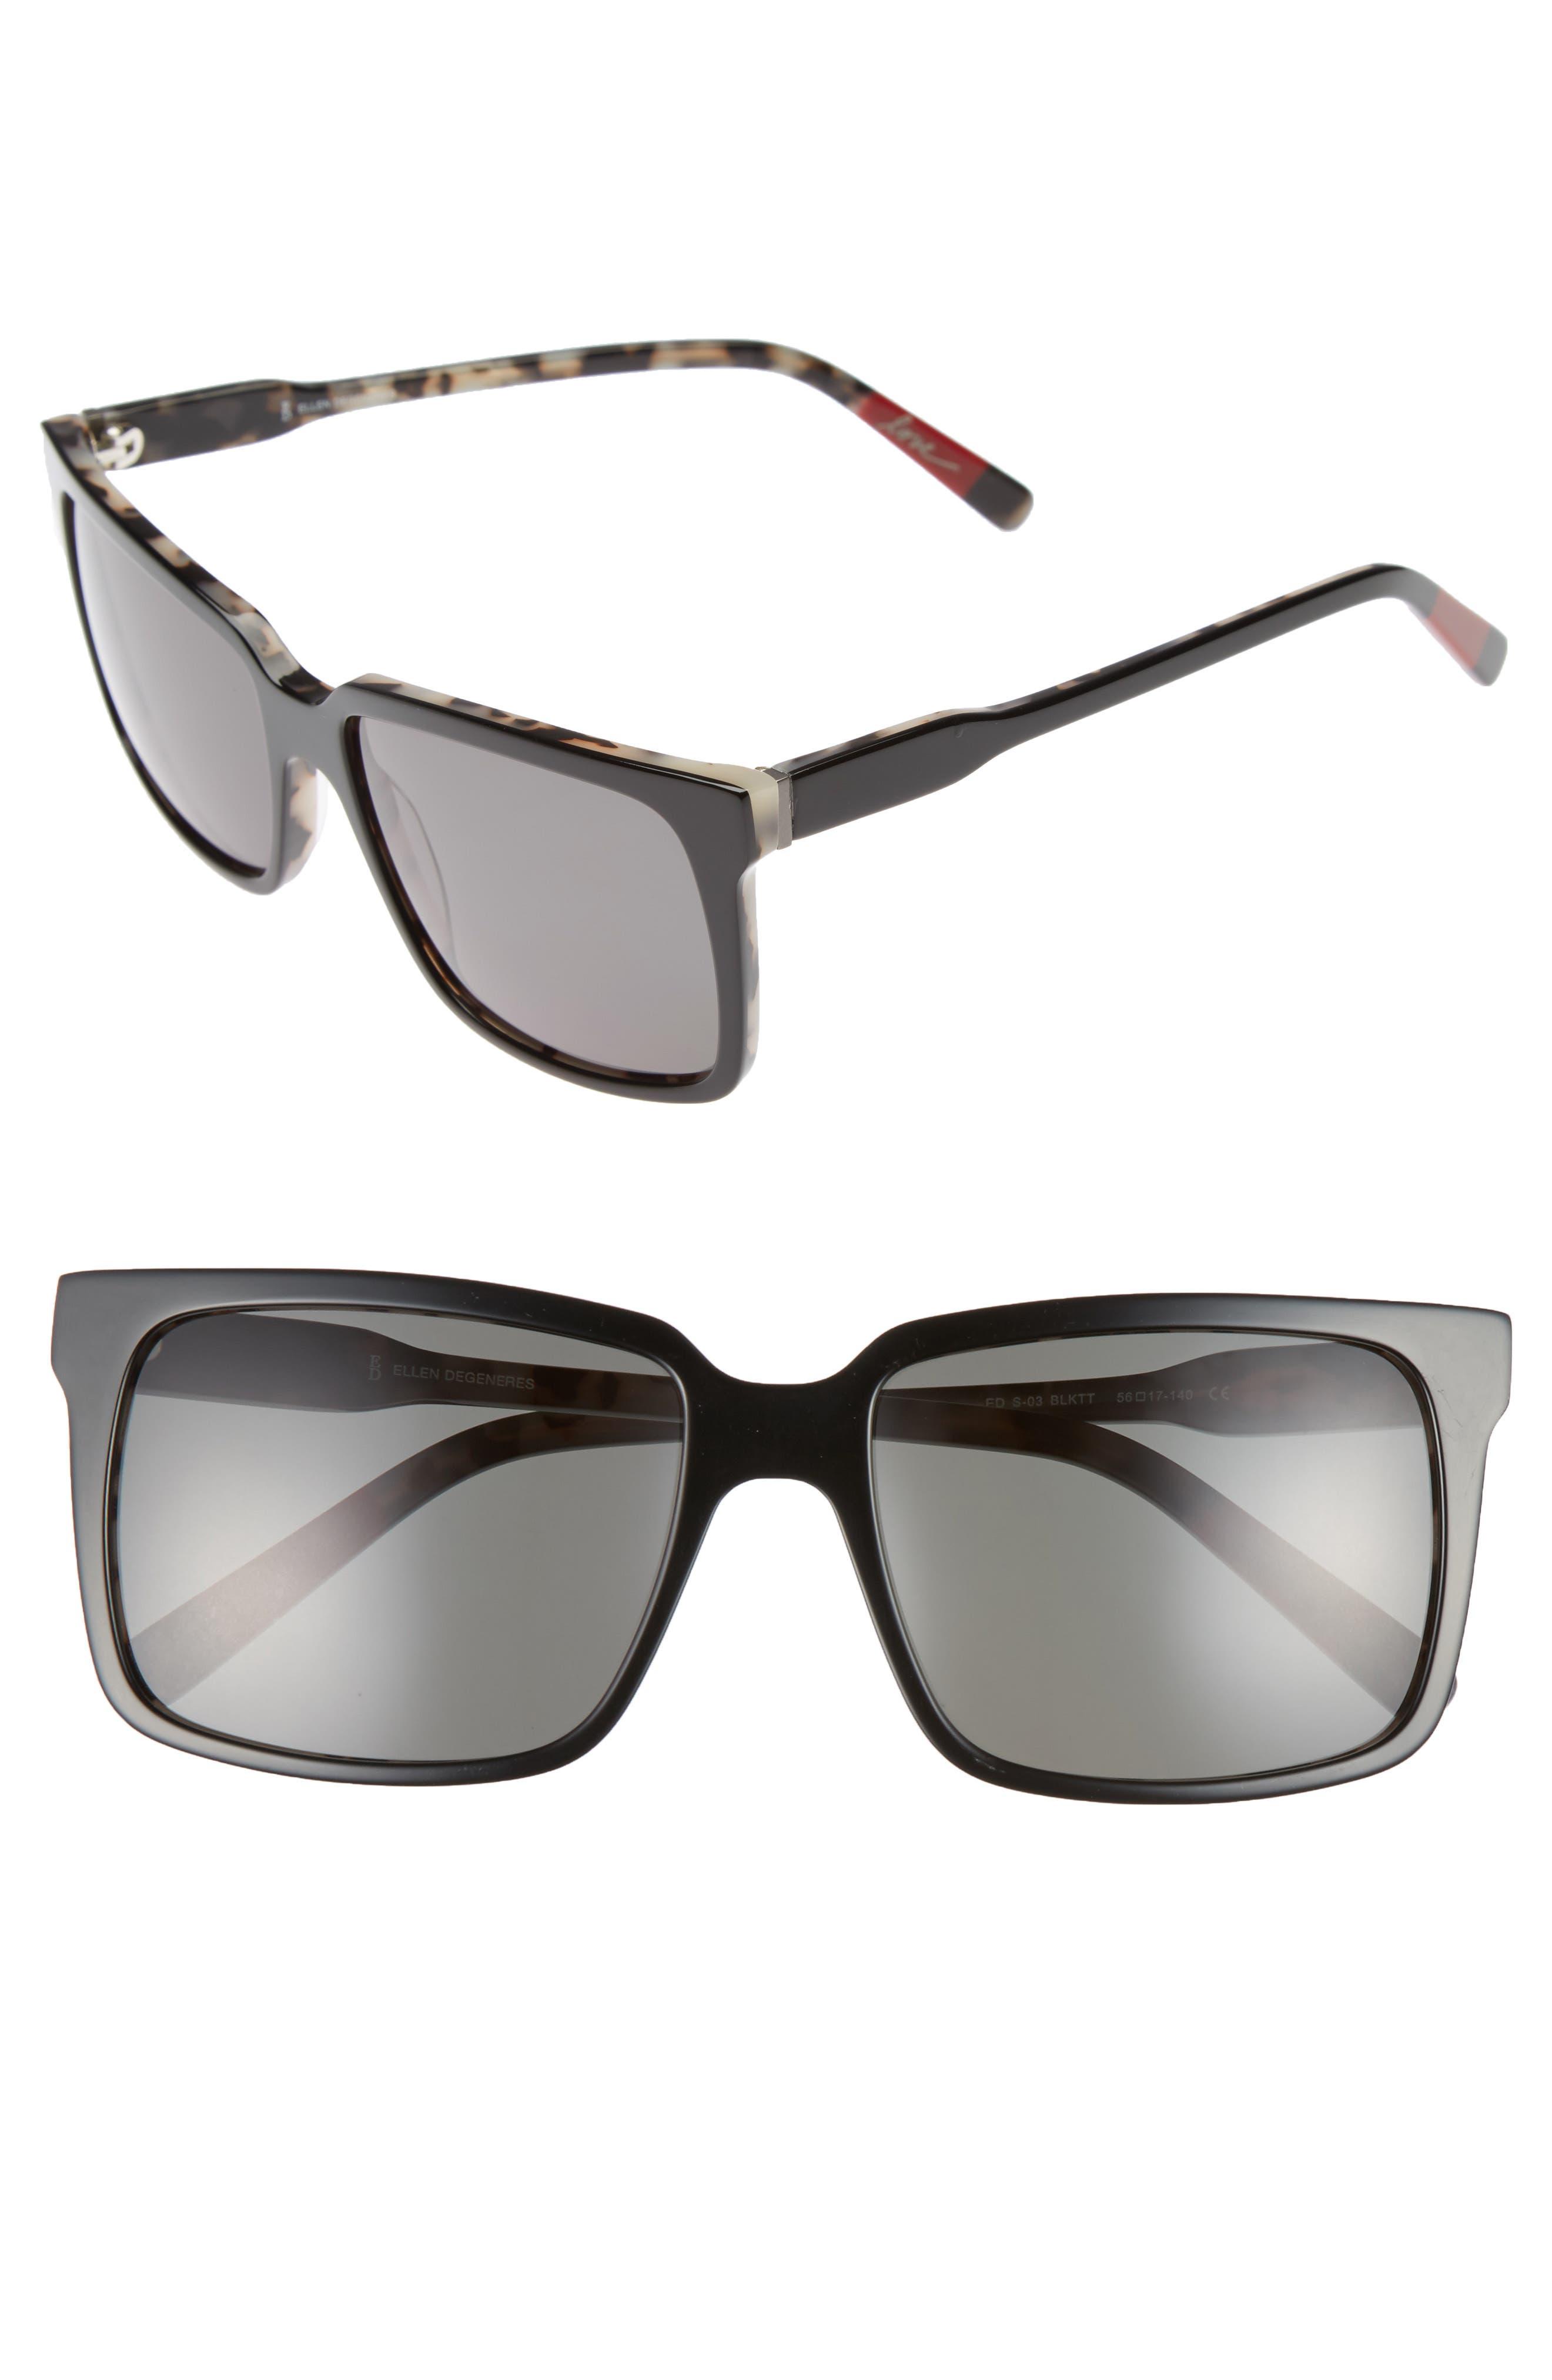 56mm Gradient Square Sunglasses,                         Main,                         color, Black Tortoise